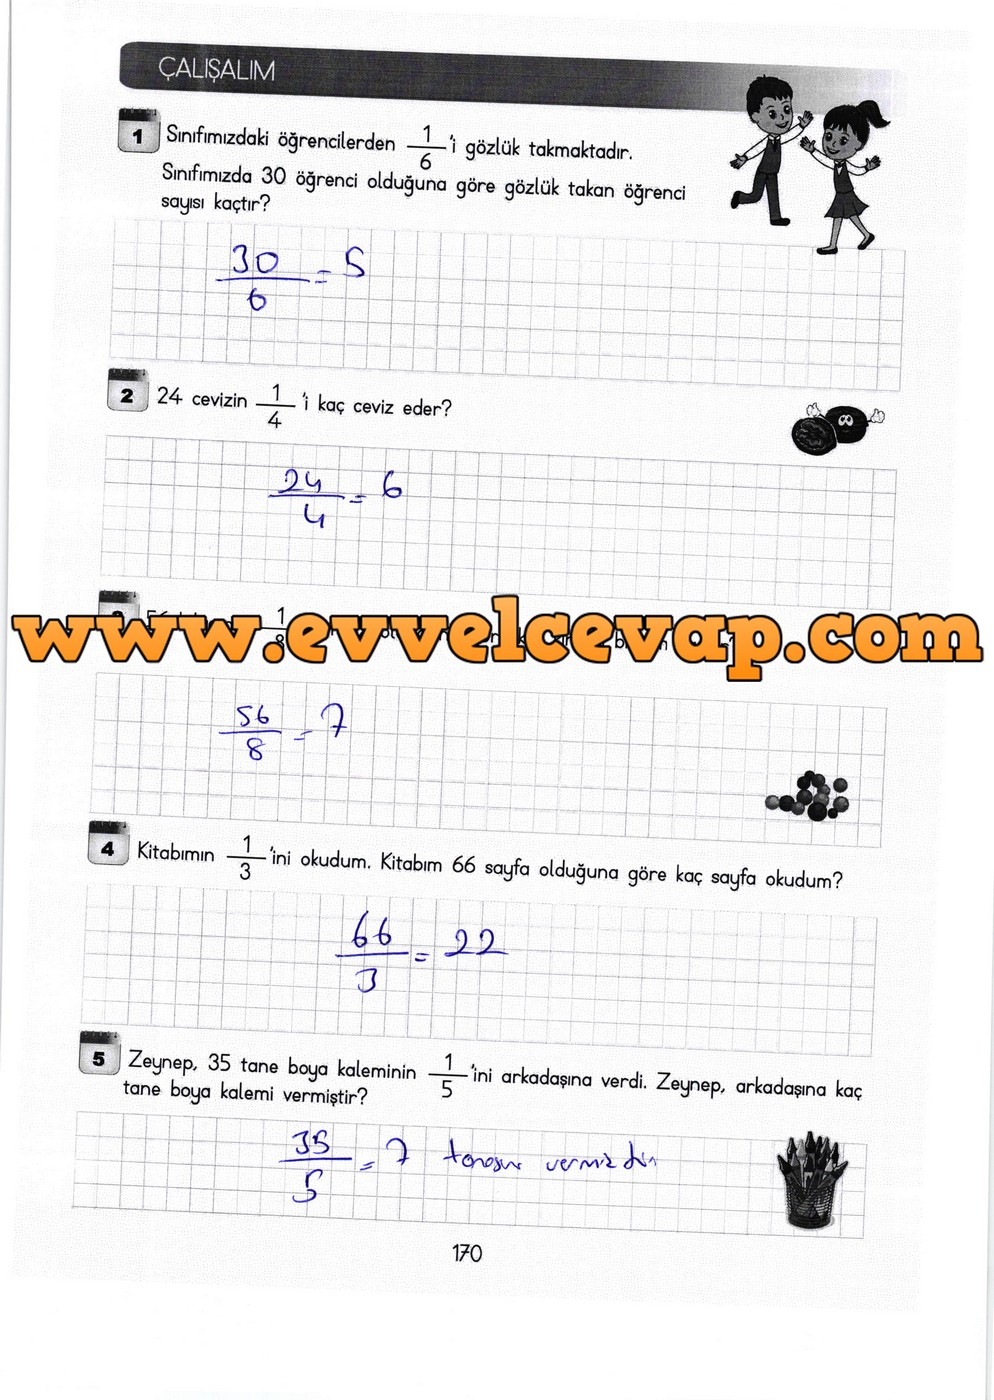 3 Sinif Meb Yayinlari Matematik Ders Kitabi Sayfa 170 Cevaplari